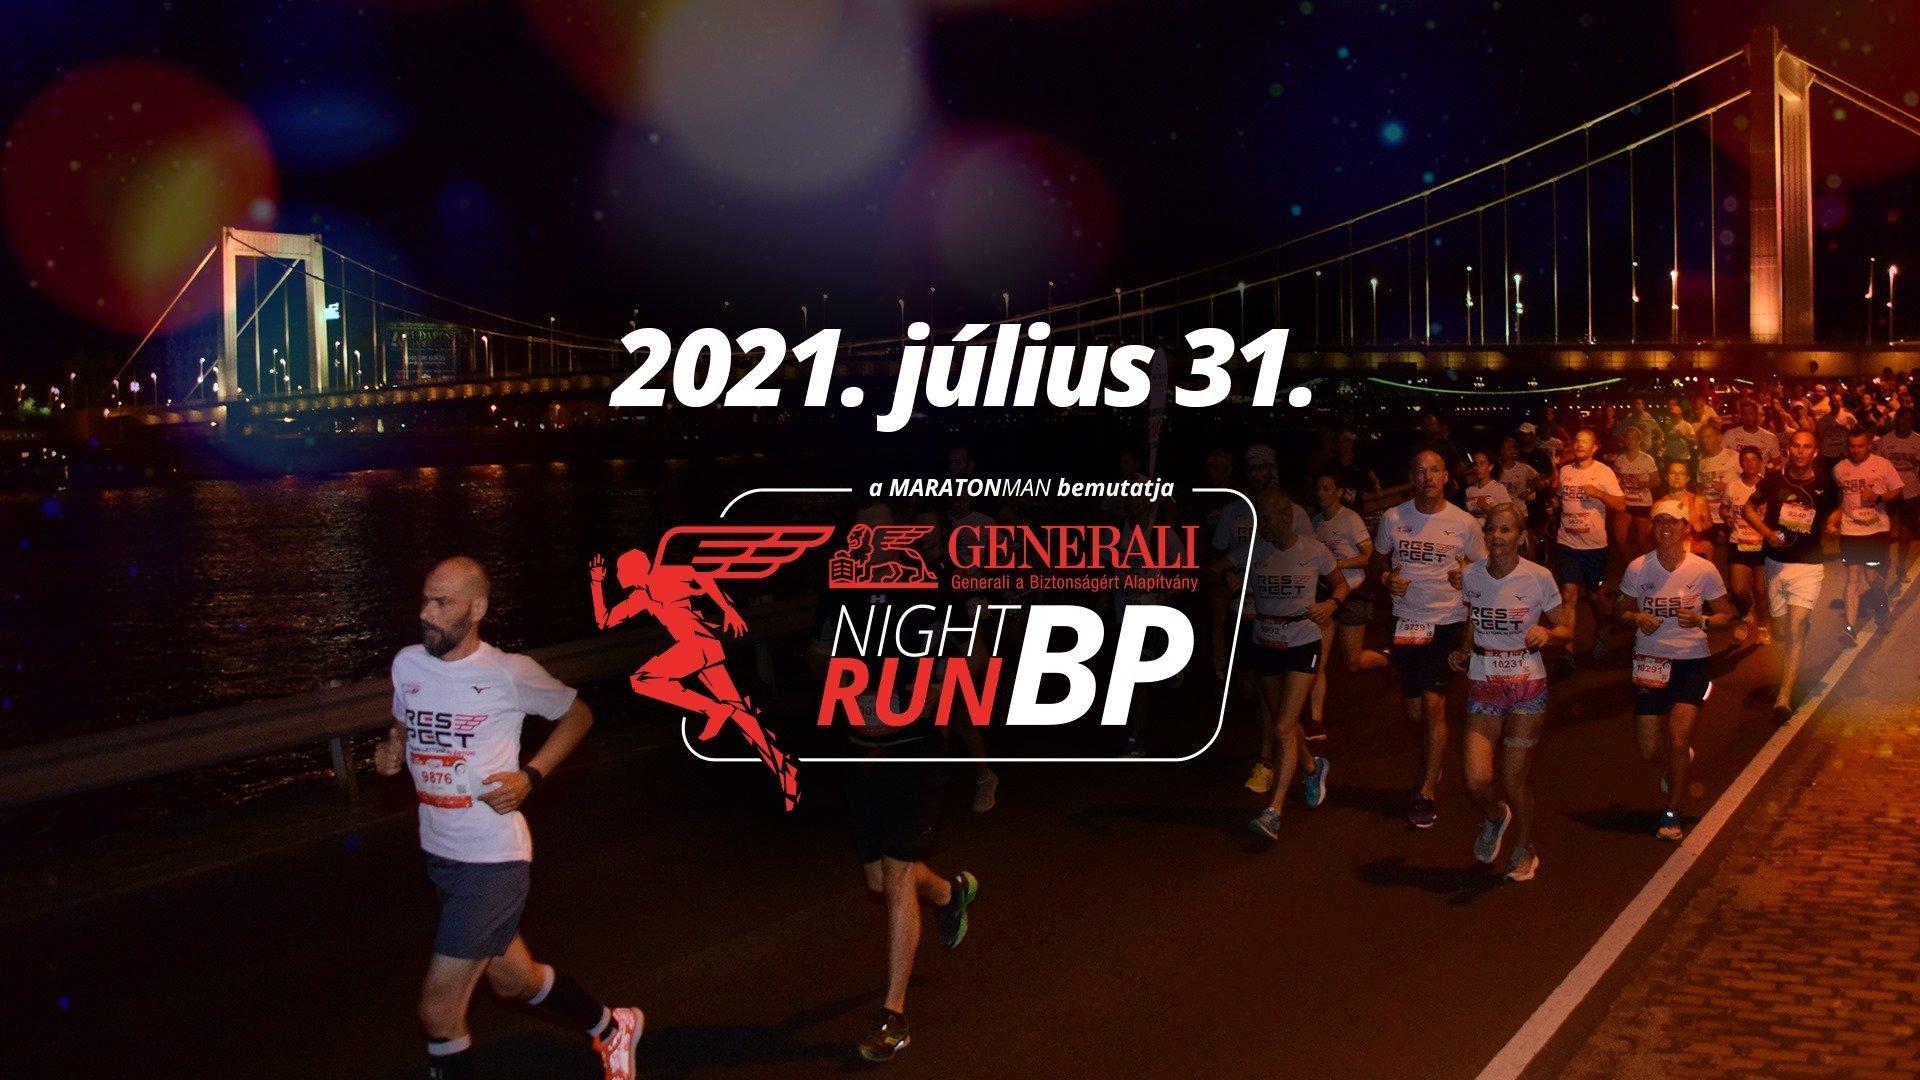 Generali Night Run